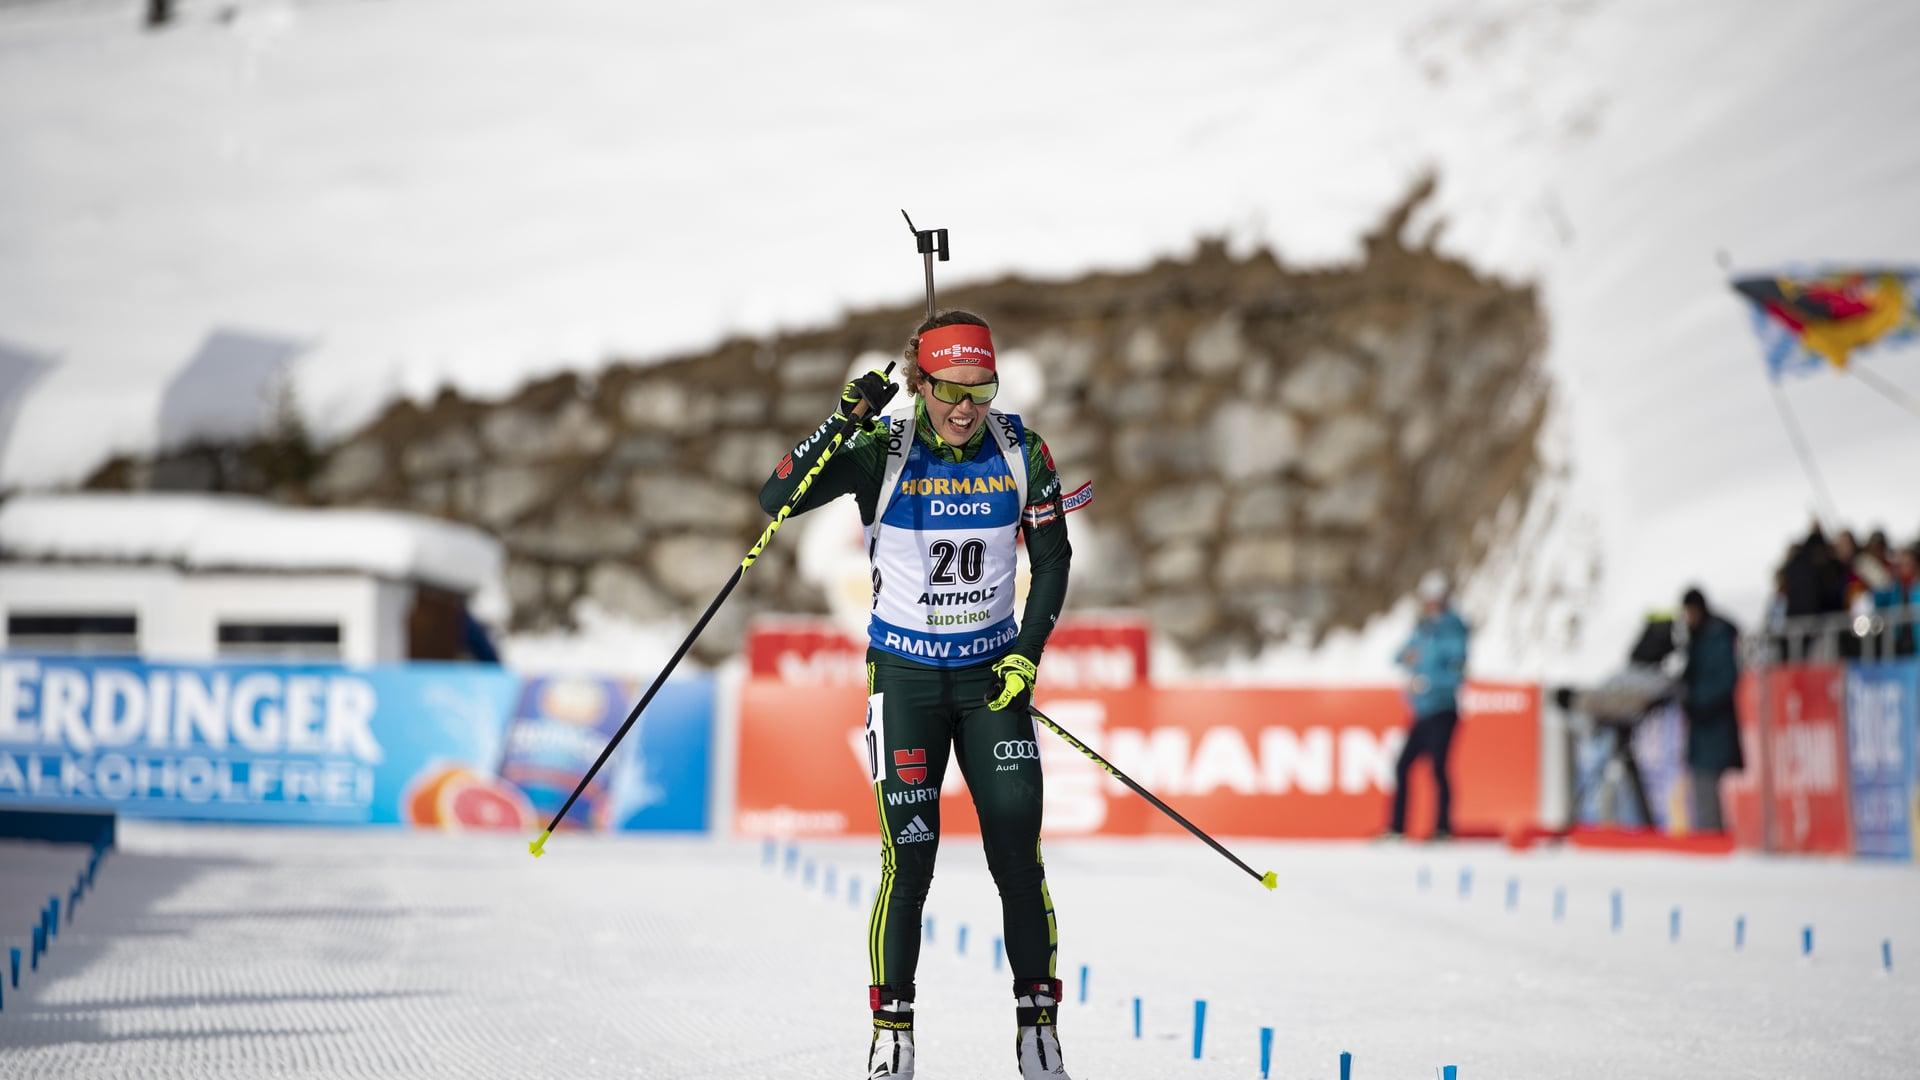 27.01.2019 - Laura Dahlmeier vince la partenza in massa ad Anterselva